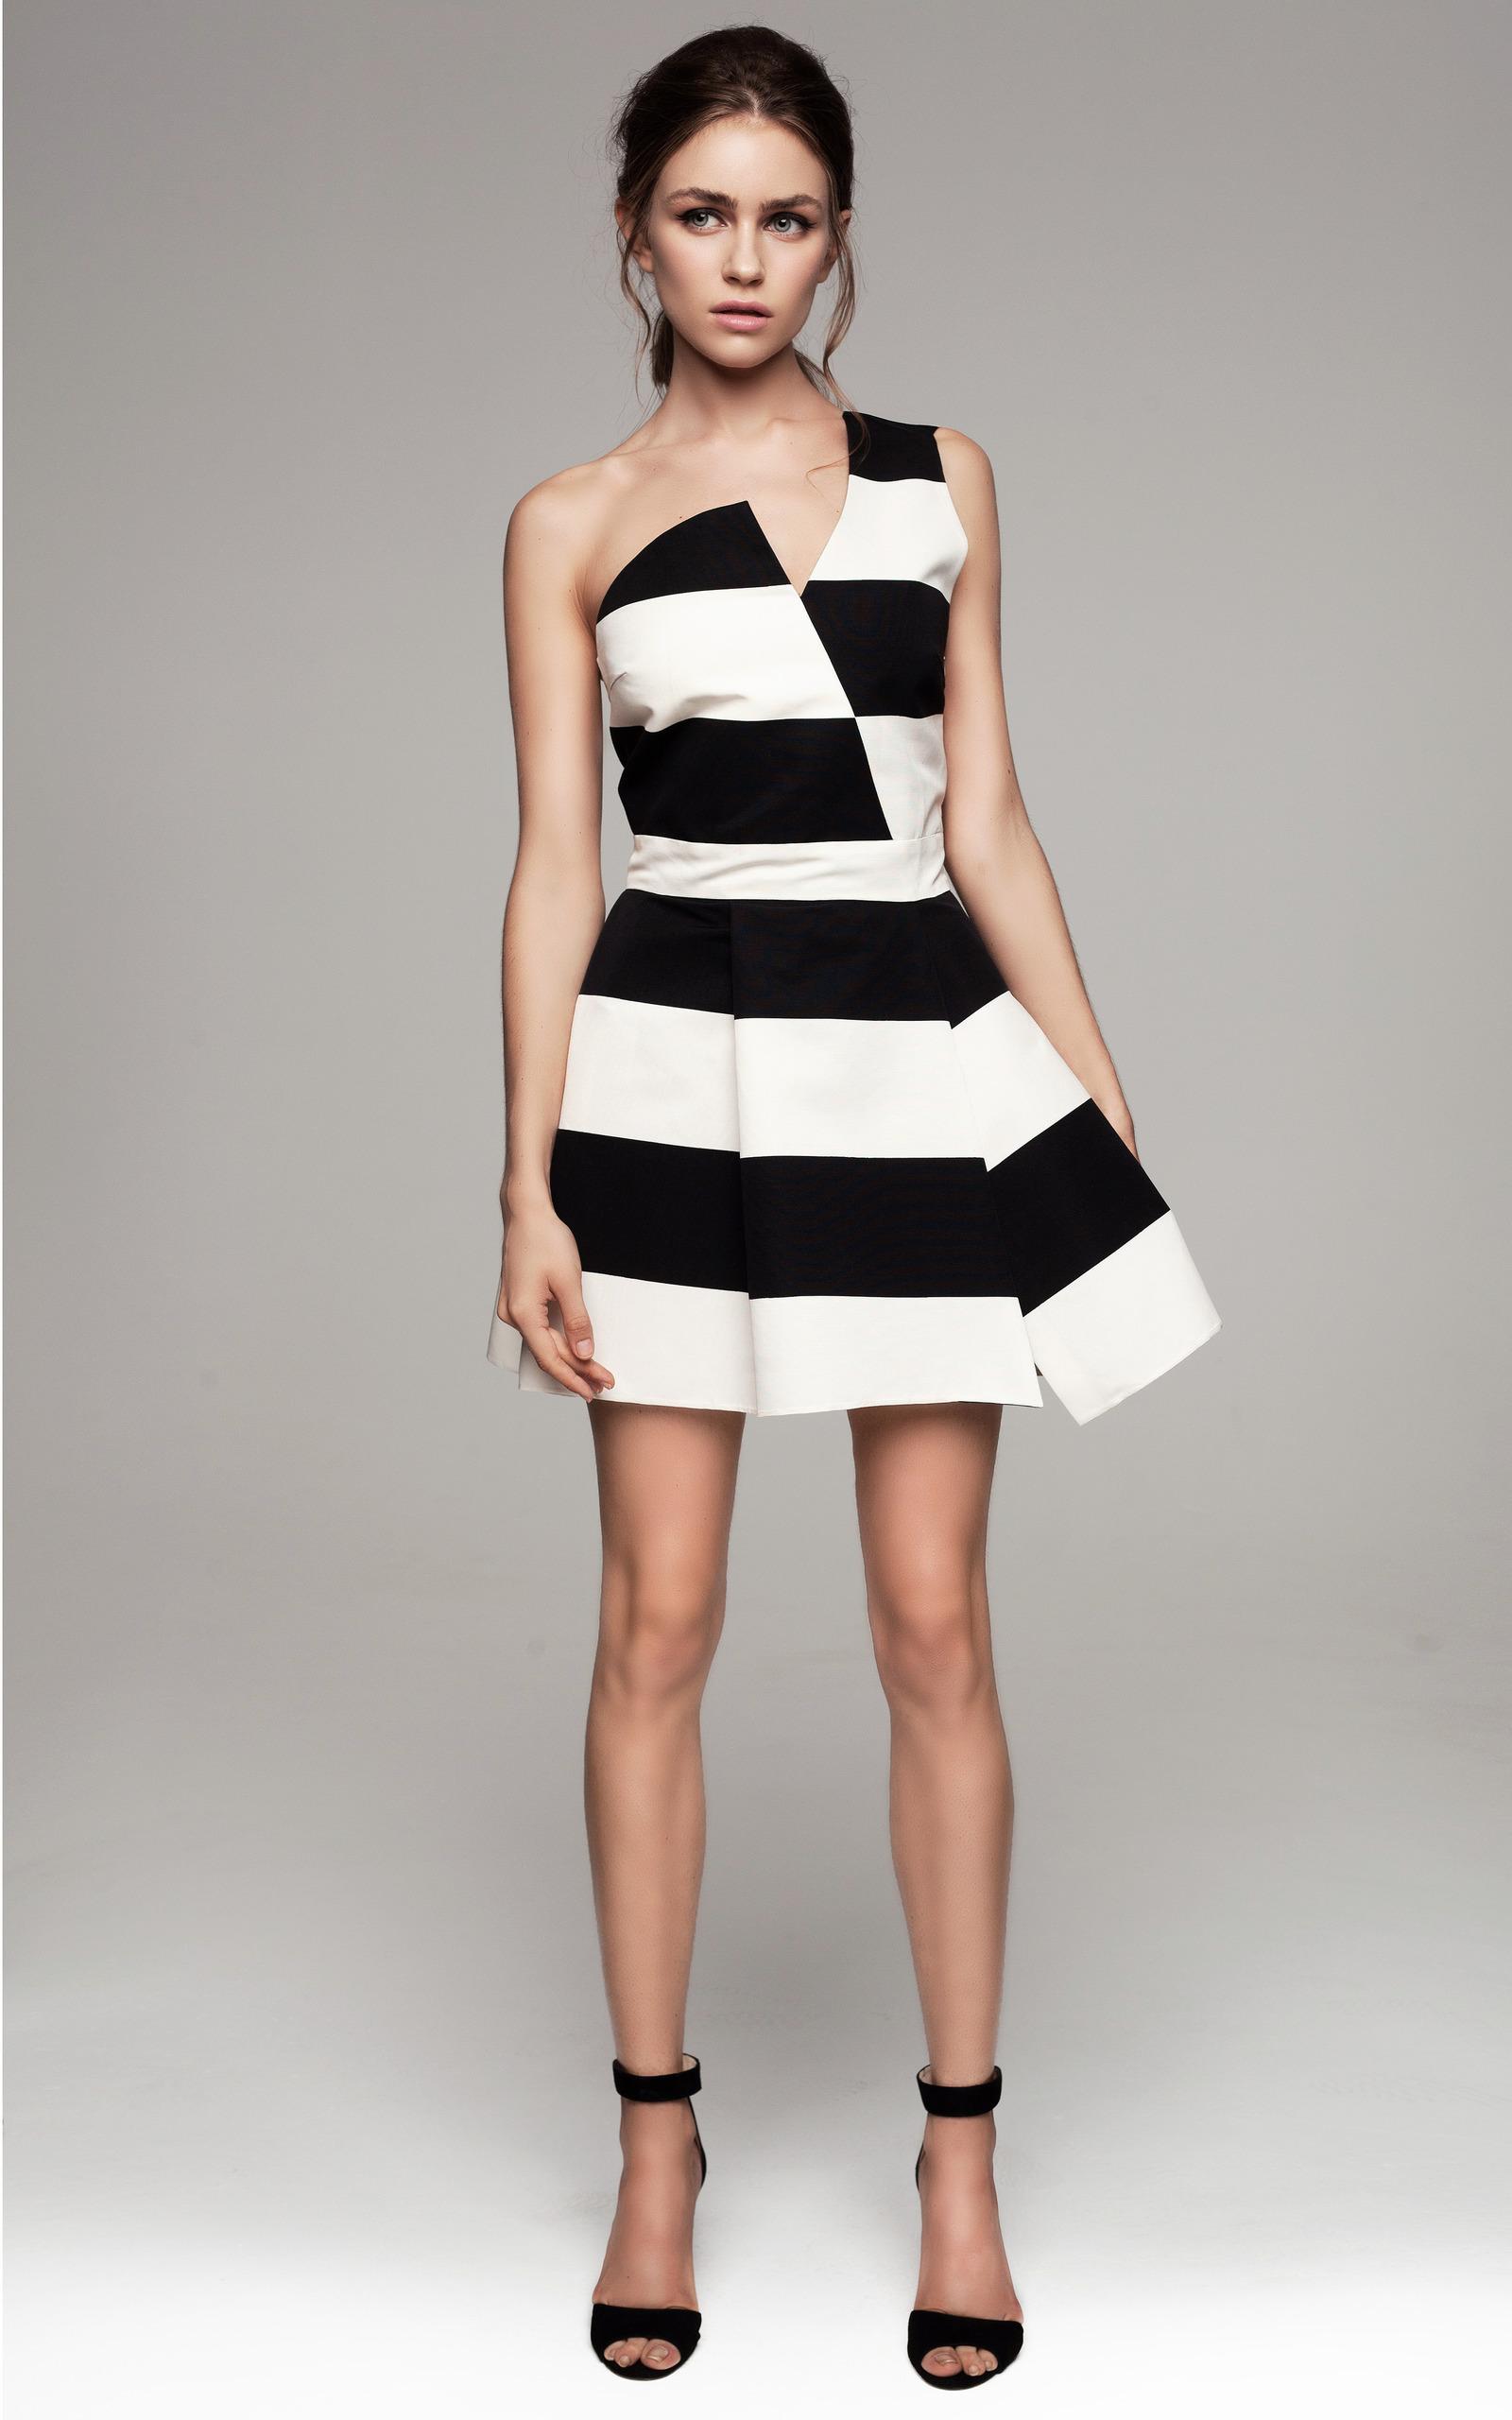 8cd578243c98 KalmanovichAsymmetric Black And White Striped Dress. CLOSE. Loading. Loading